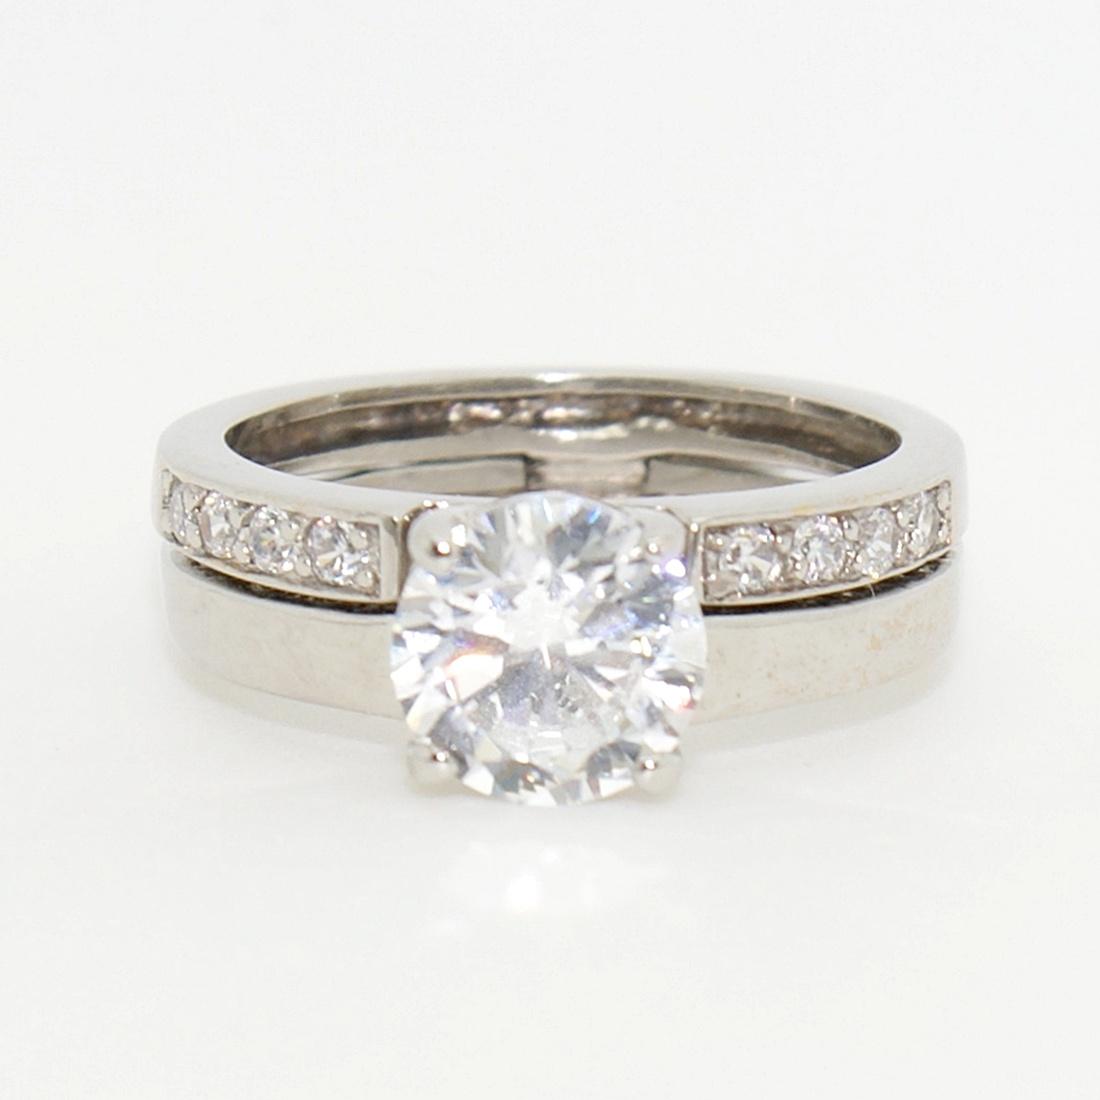 Zsanéros solitair gyűrű